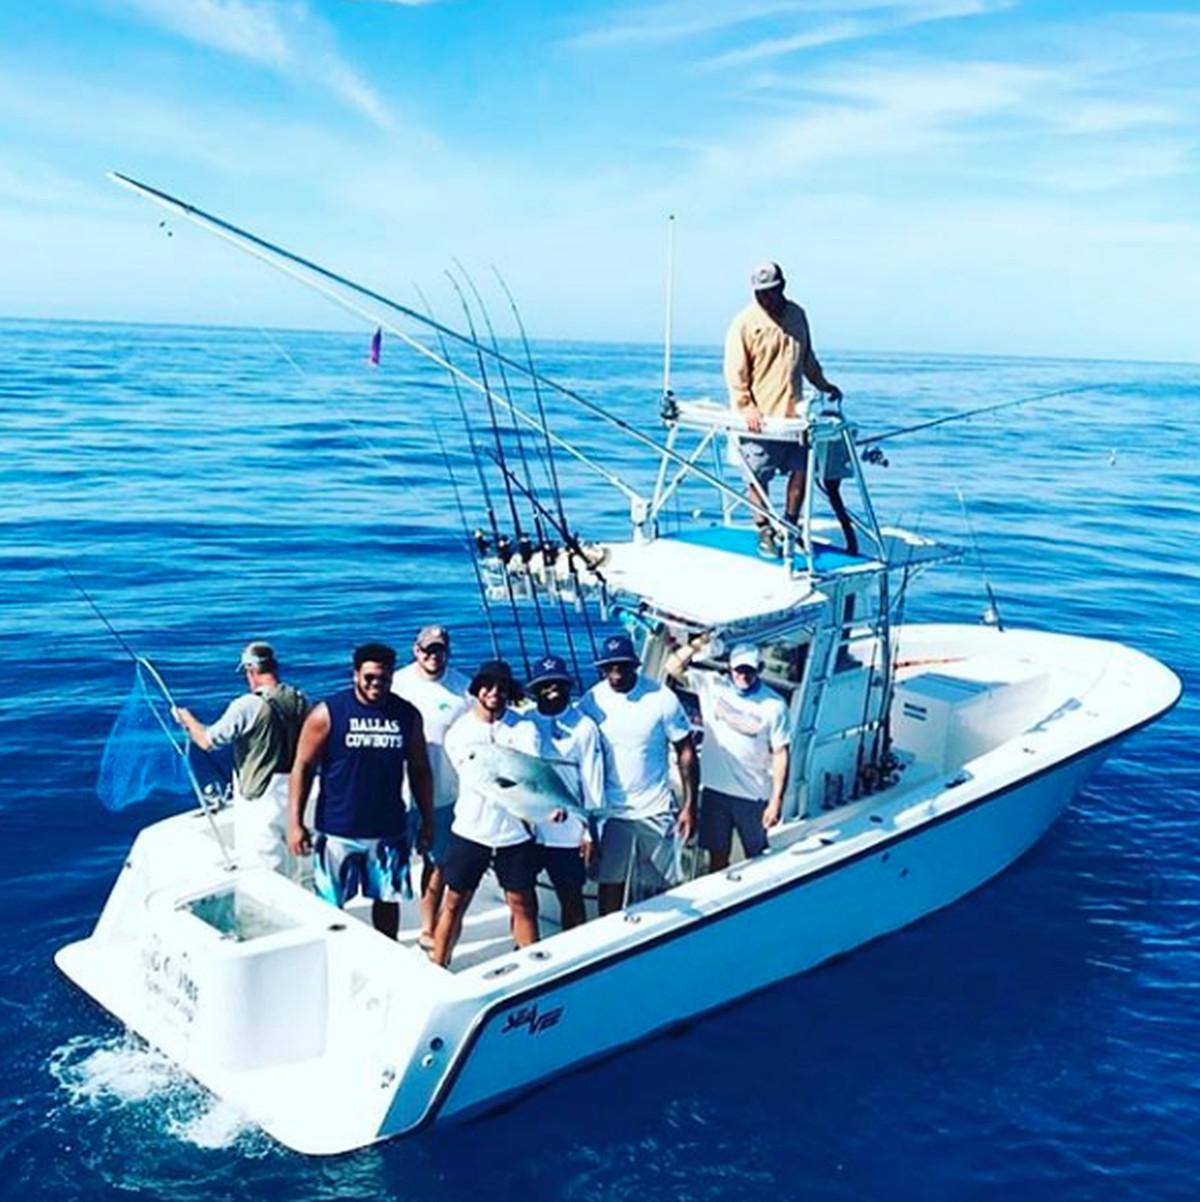 Some dallas cowboys leadership council members took a fishing trips dak prescott on instagram malvernweather Gallery